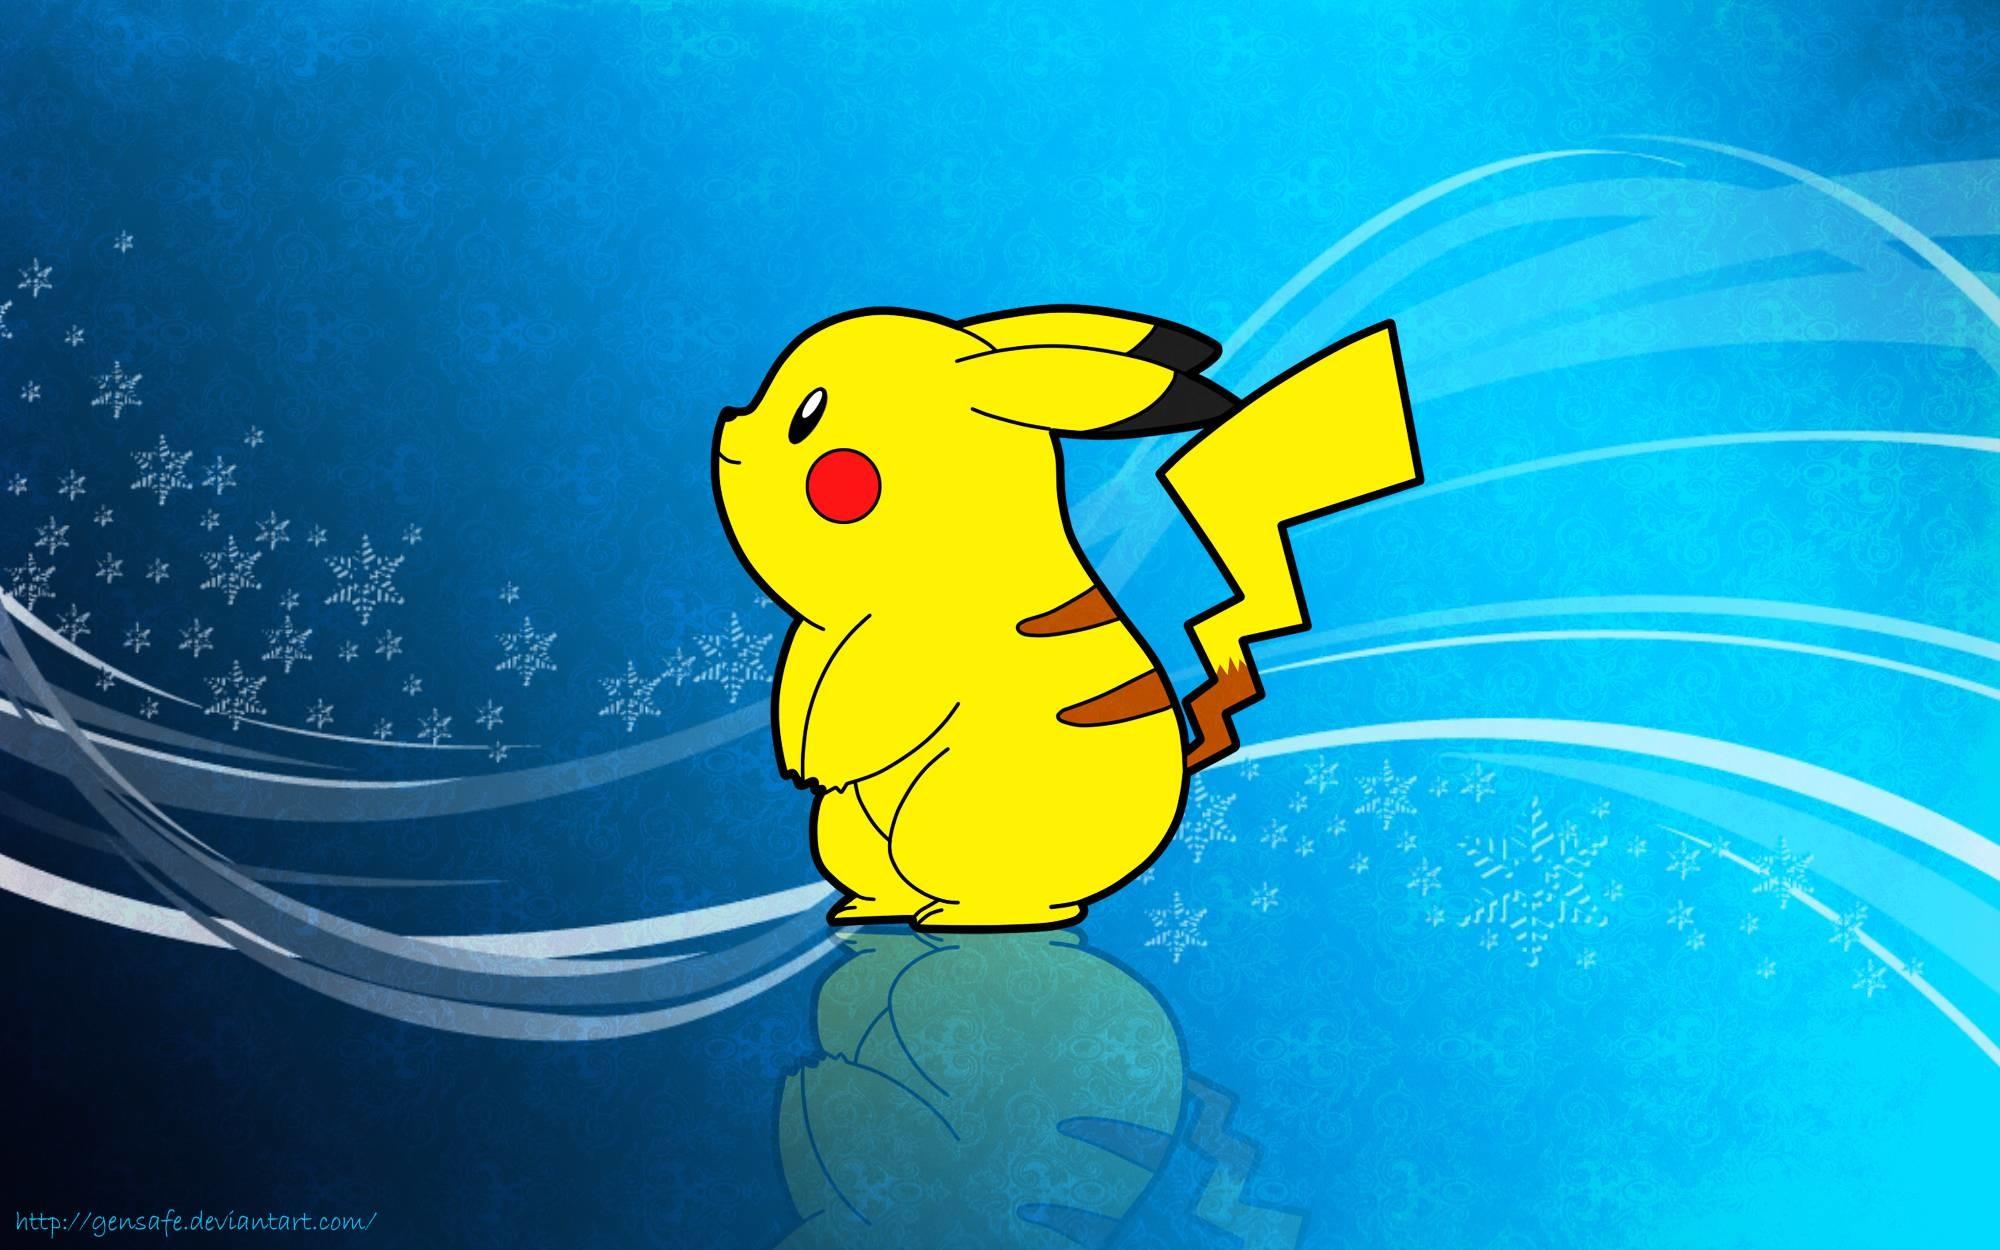 Wallpapers For > Pokemon Wallpaper Pikachu Hd